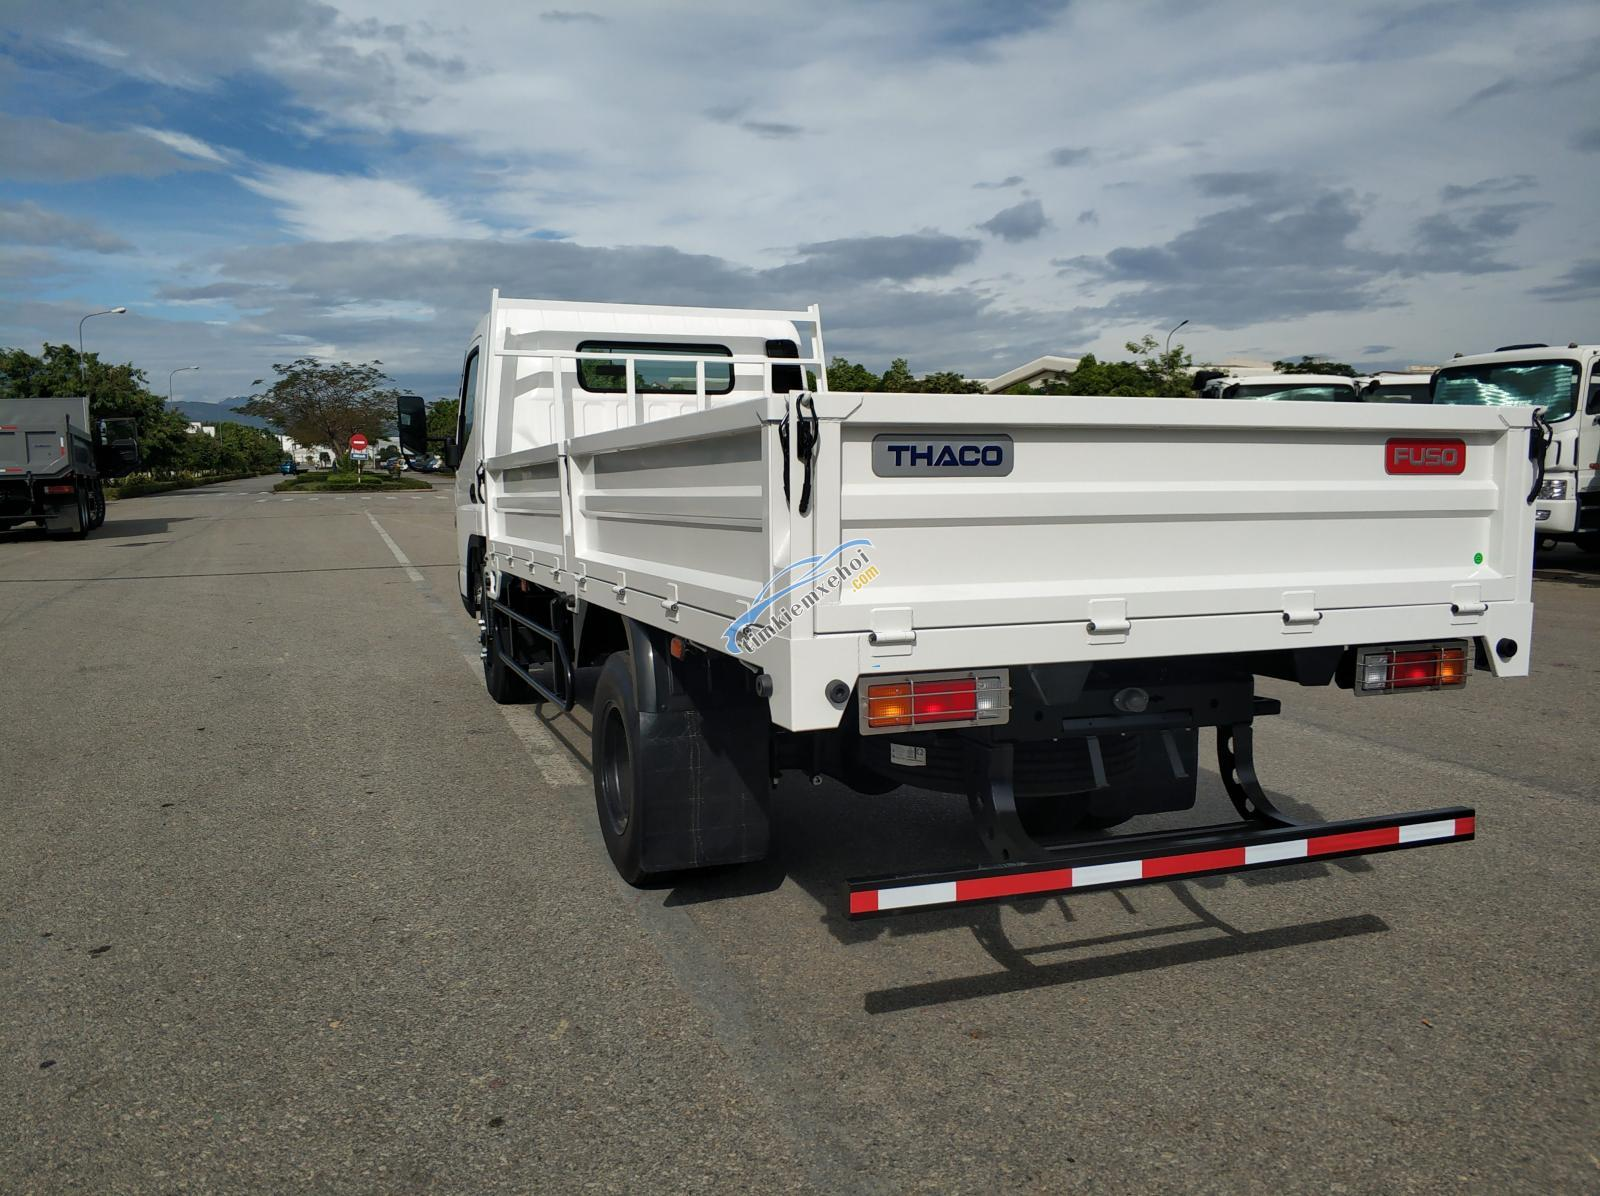 Xe tải Misubishi Fuso Canter 6.5 thùng lửng 3,49 tấn